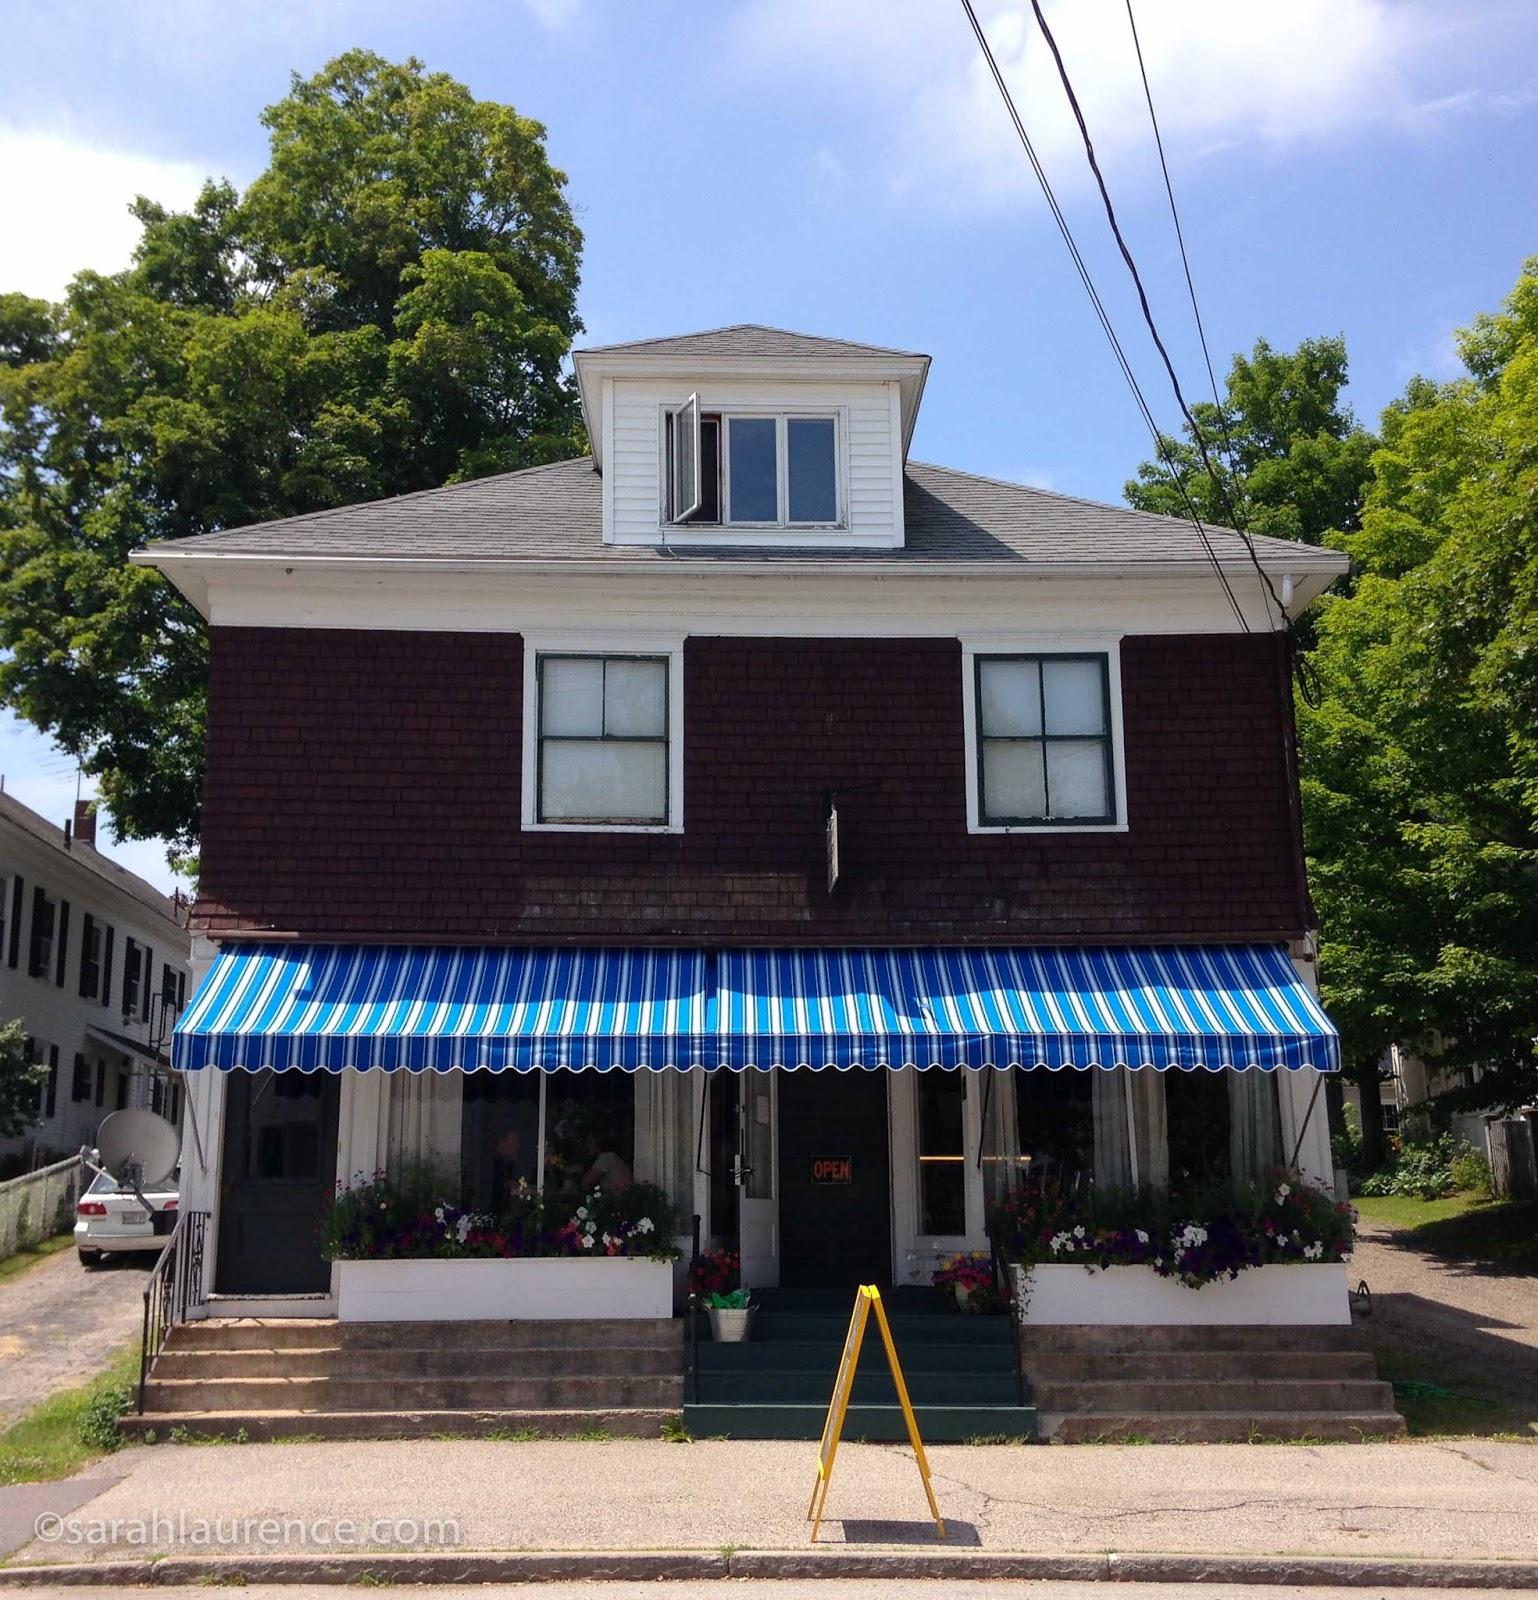 Sarah Laurence: The Union Street Bakery, Brunswick, Maine